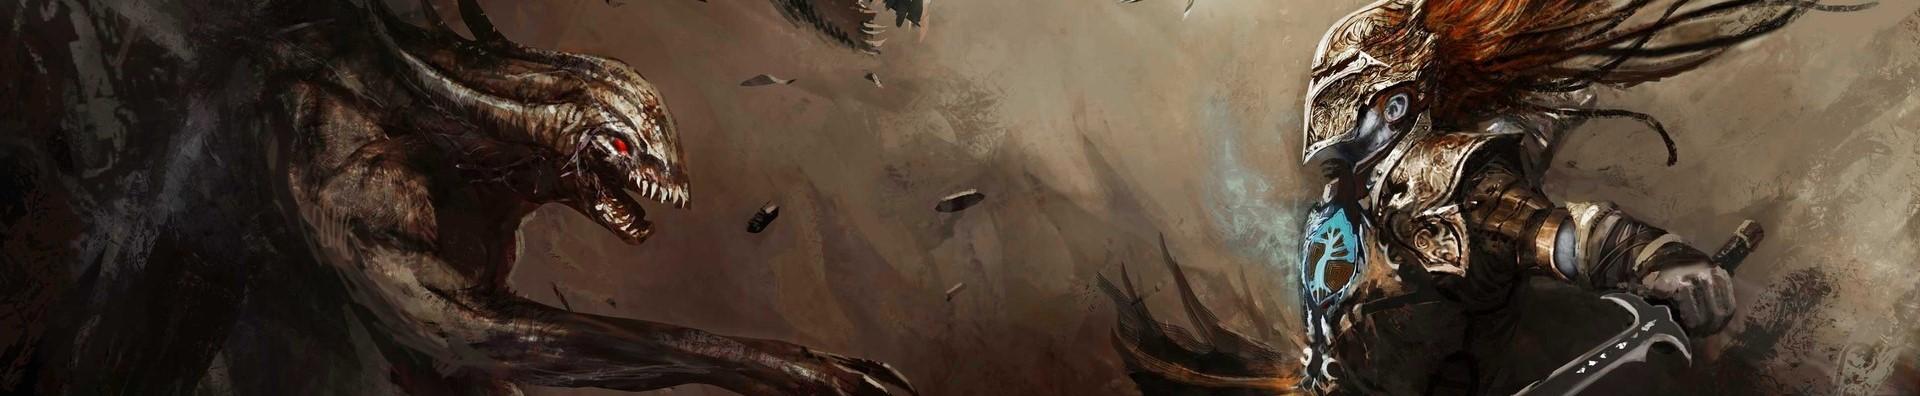 Demons vs angels war wallpaper 1  3